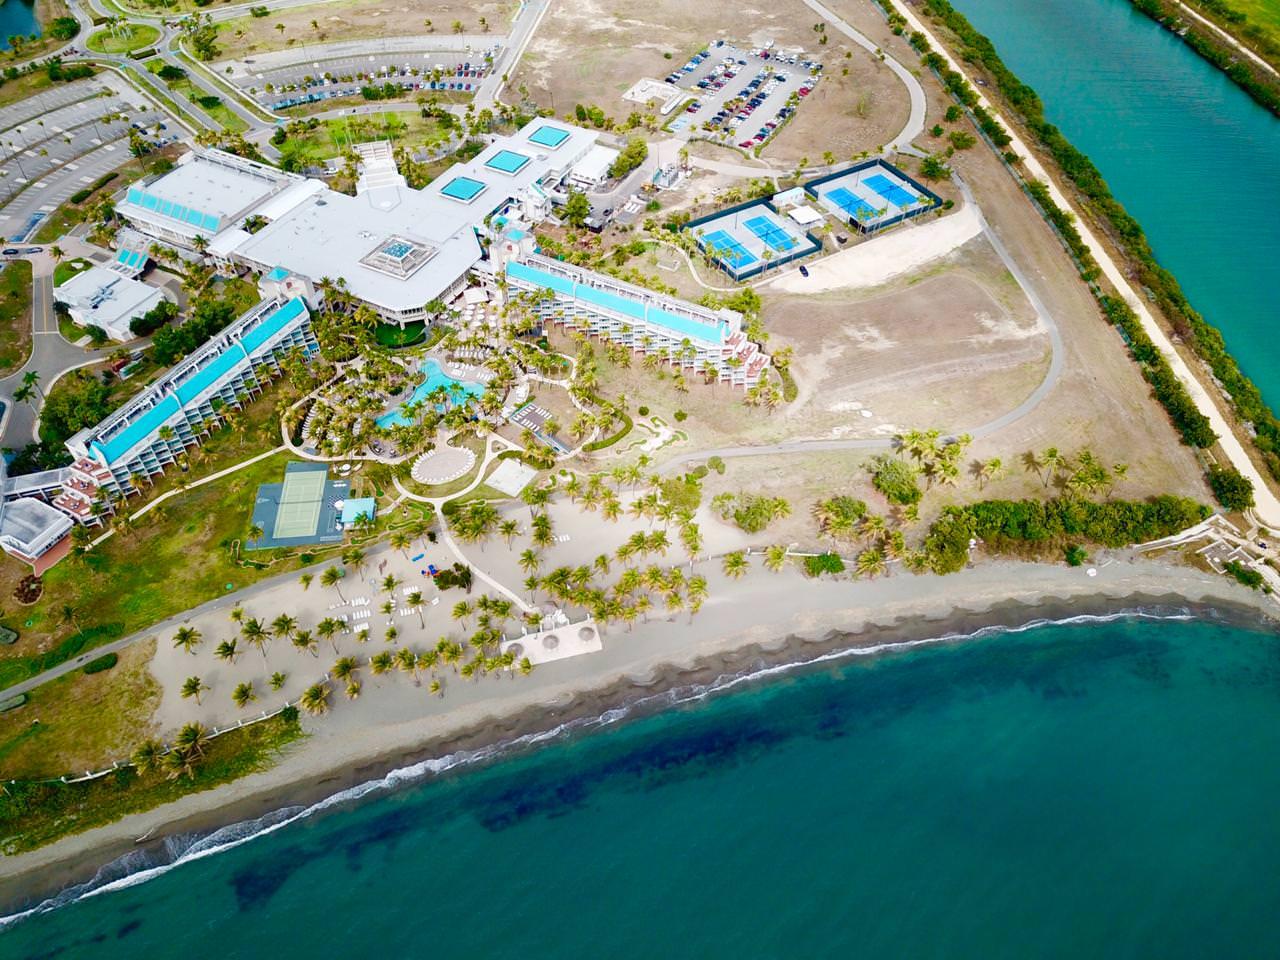 Ponce golf and casino resort margaritaville casino flamingo las vegas